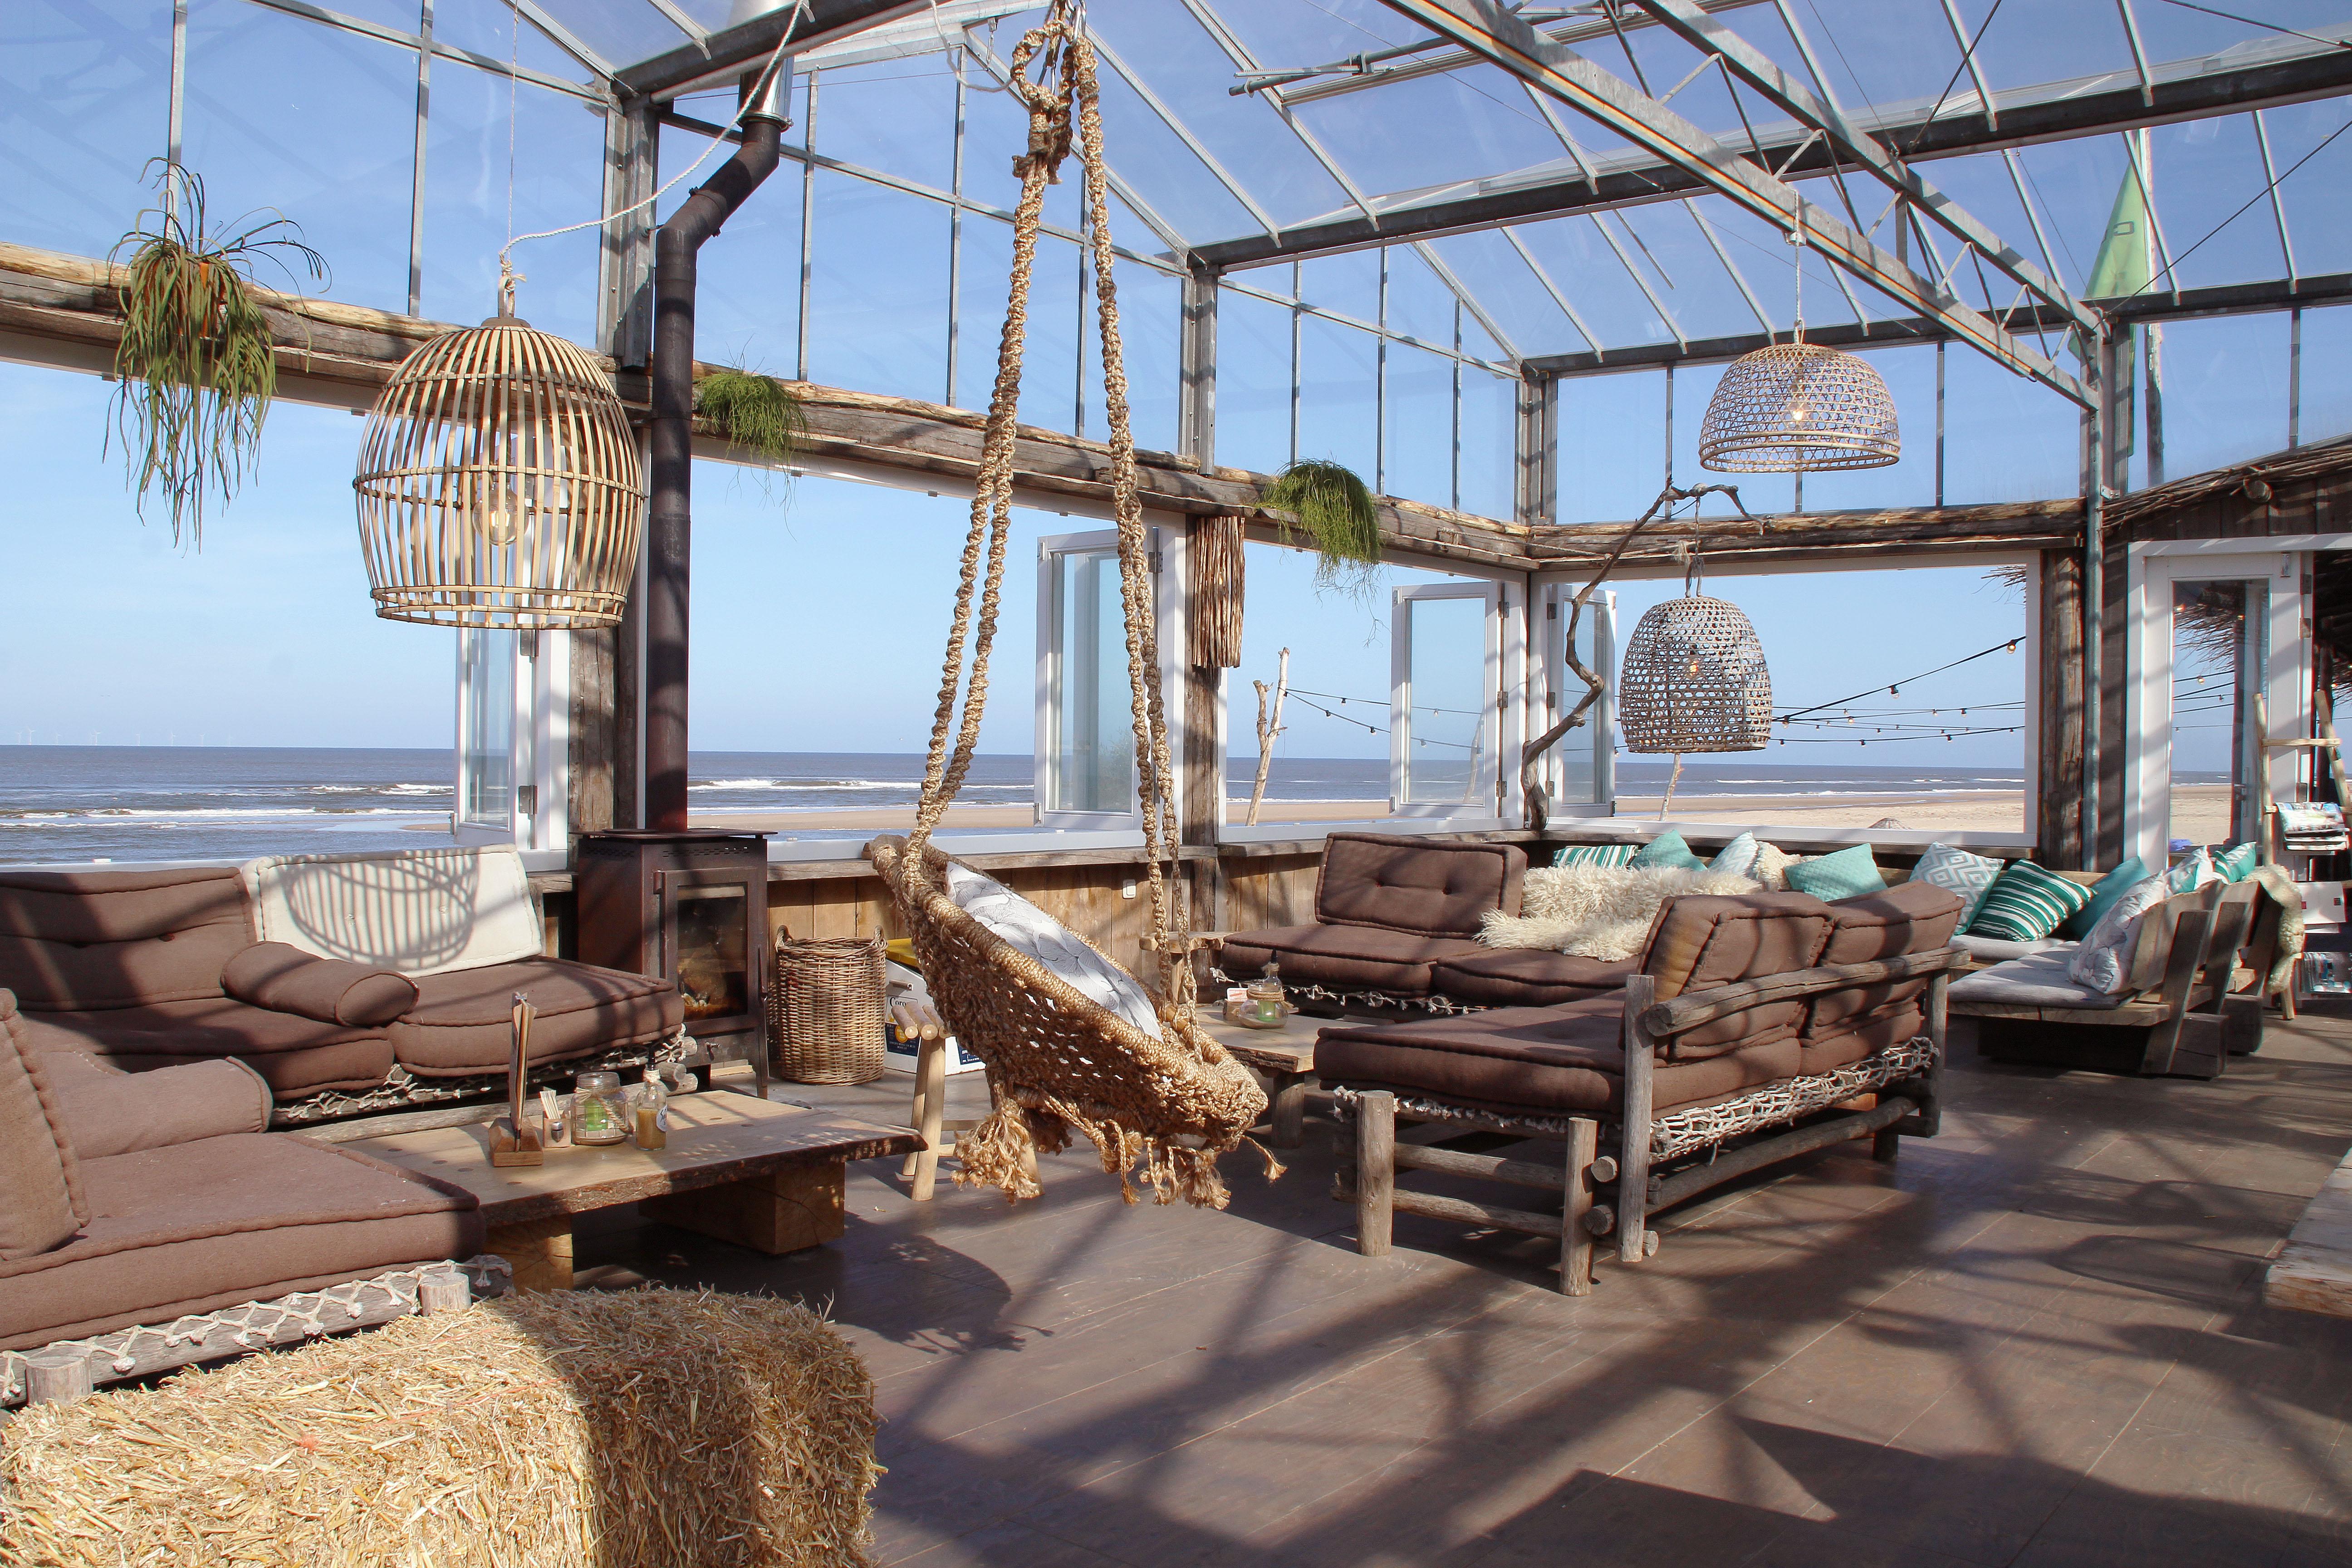 boho-interieur-strandtent-hotspot